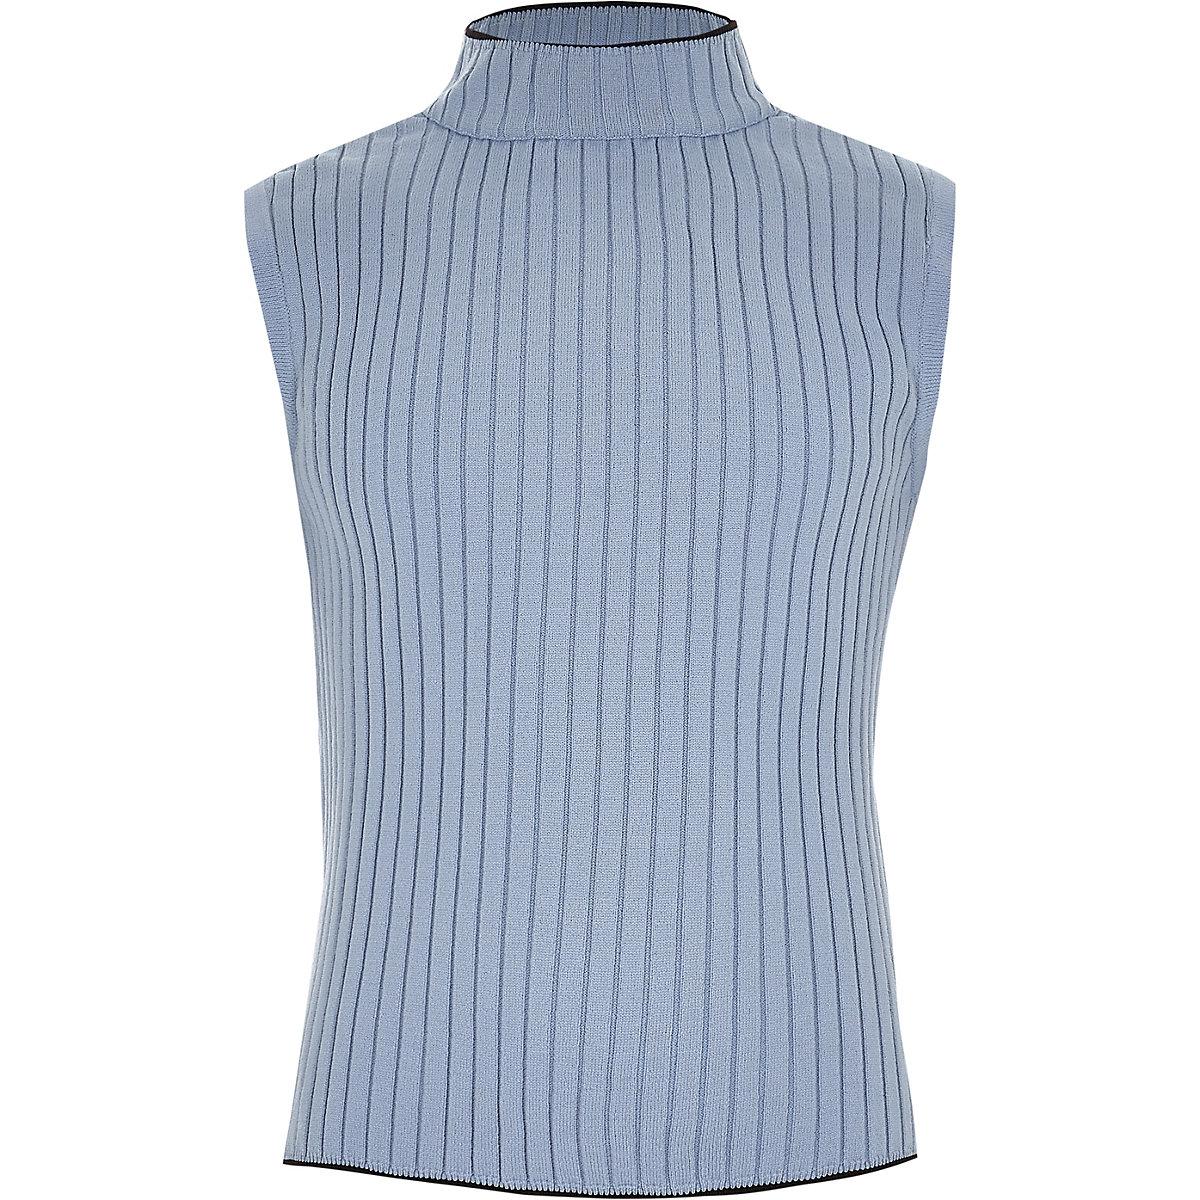 Girls blue rib turtle neck tank top